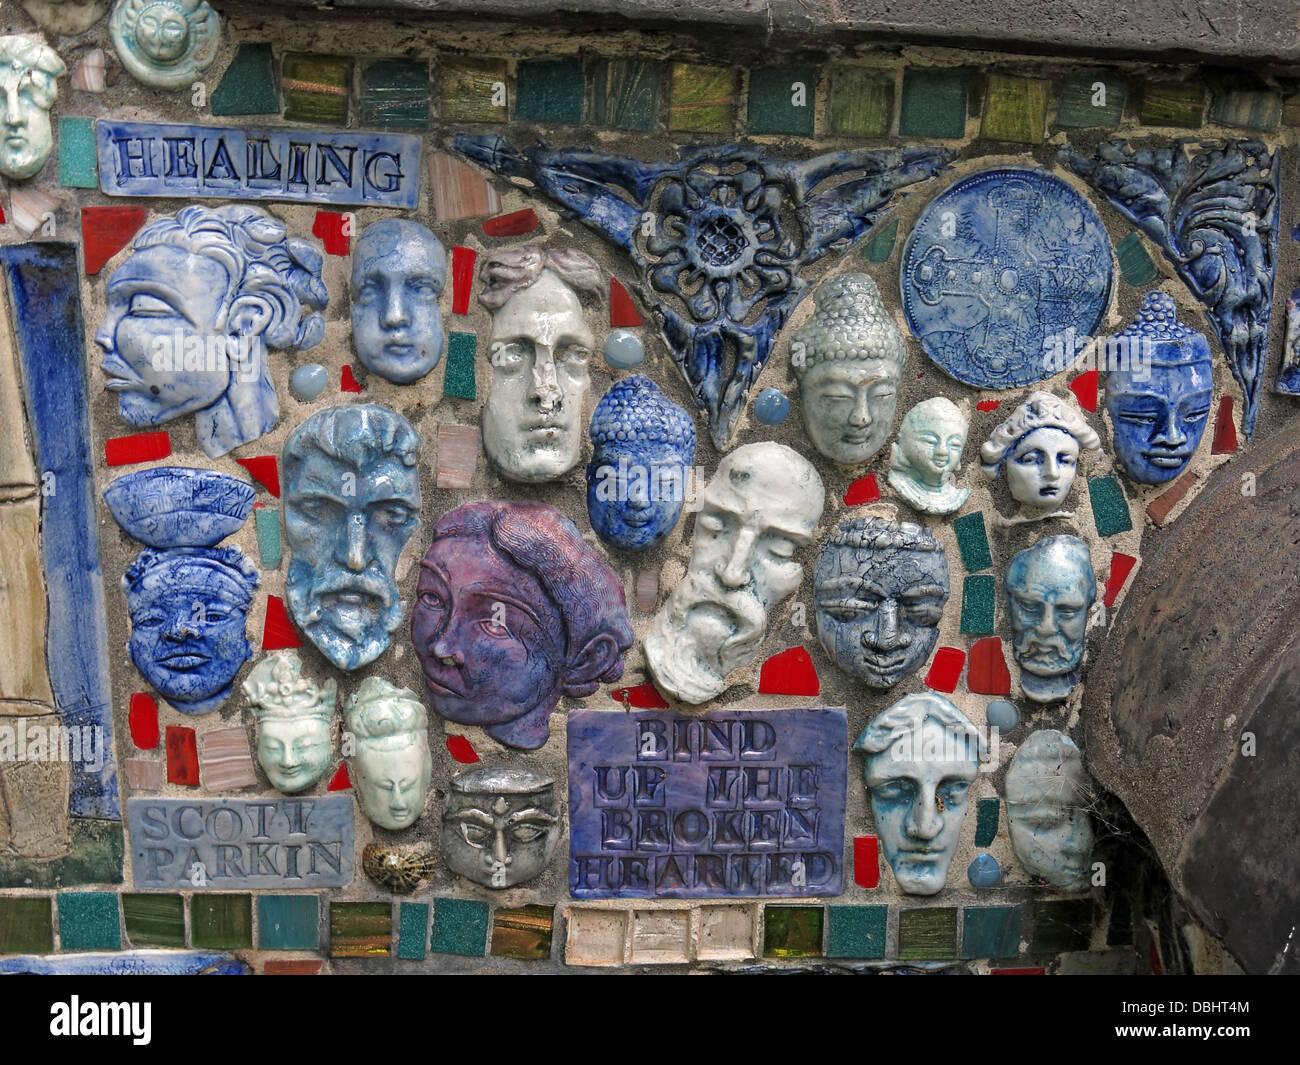 The Stoke Minster Pottery Bench - Stock Image